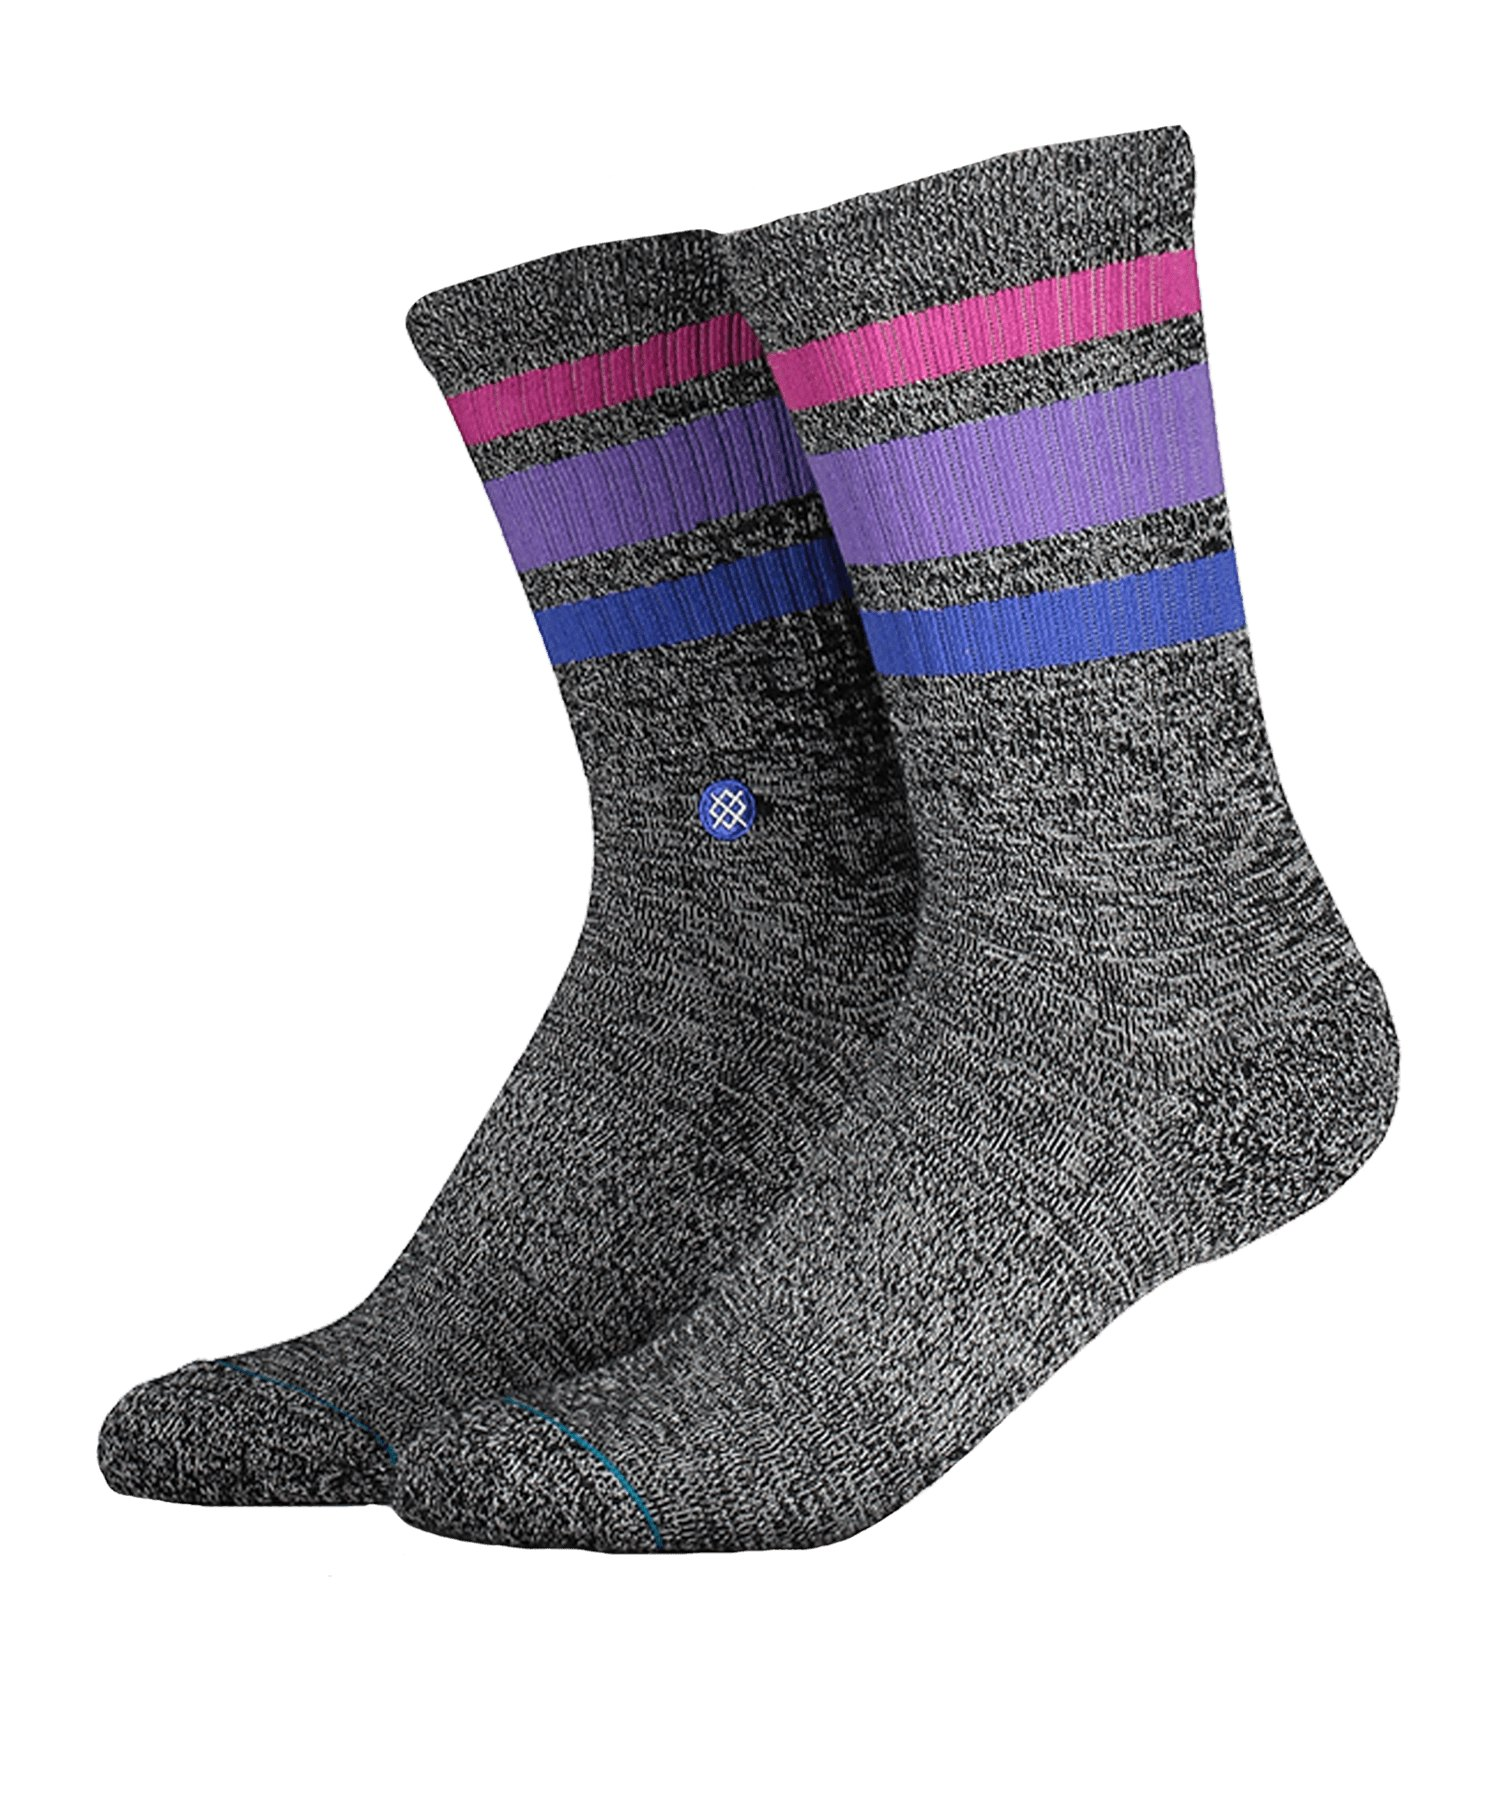 Stance Uncommon Solids Boyd 4 Socken Grau - grau